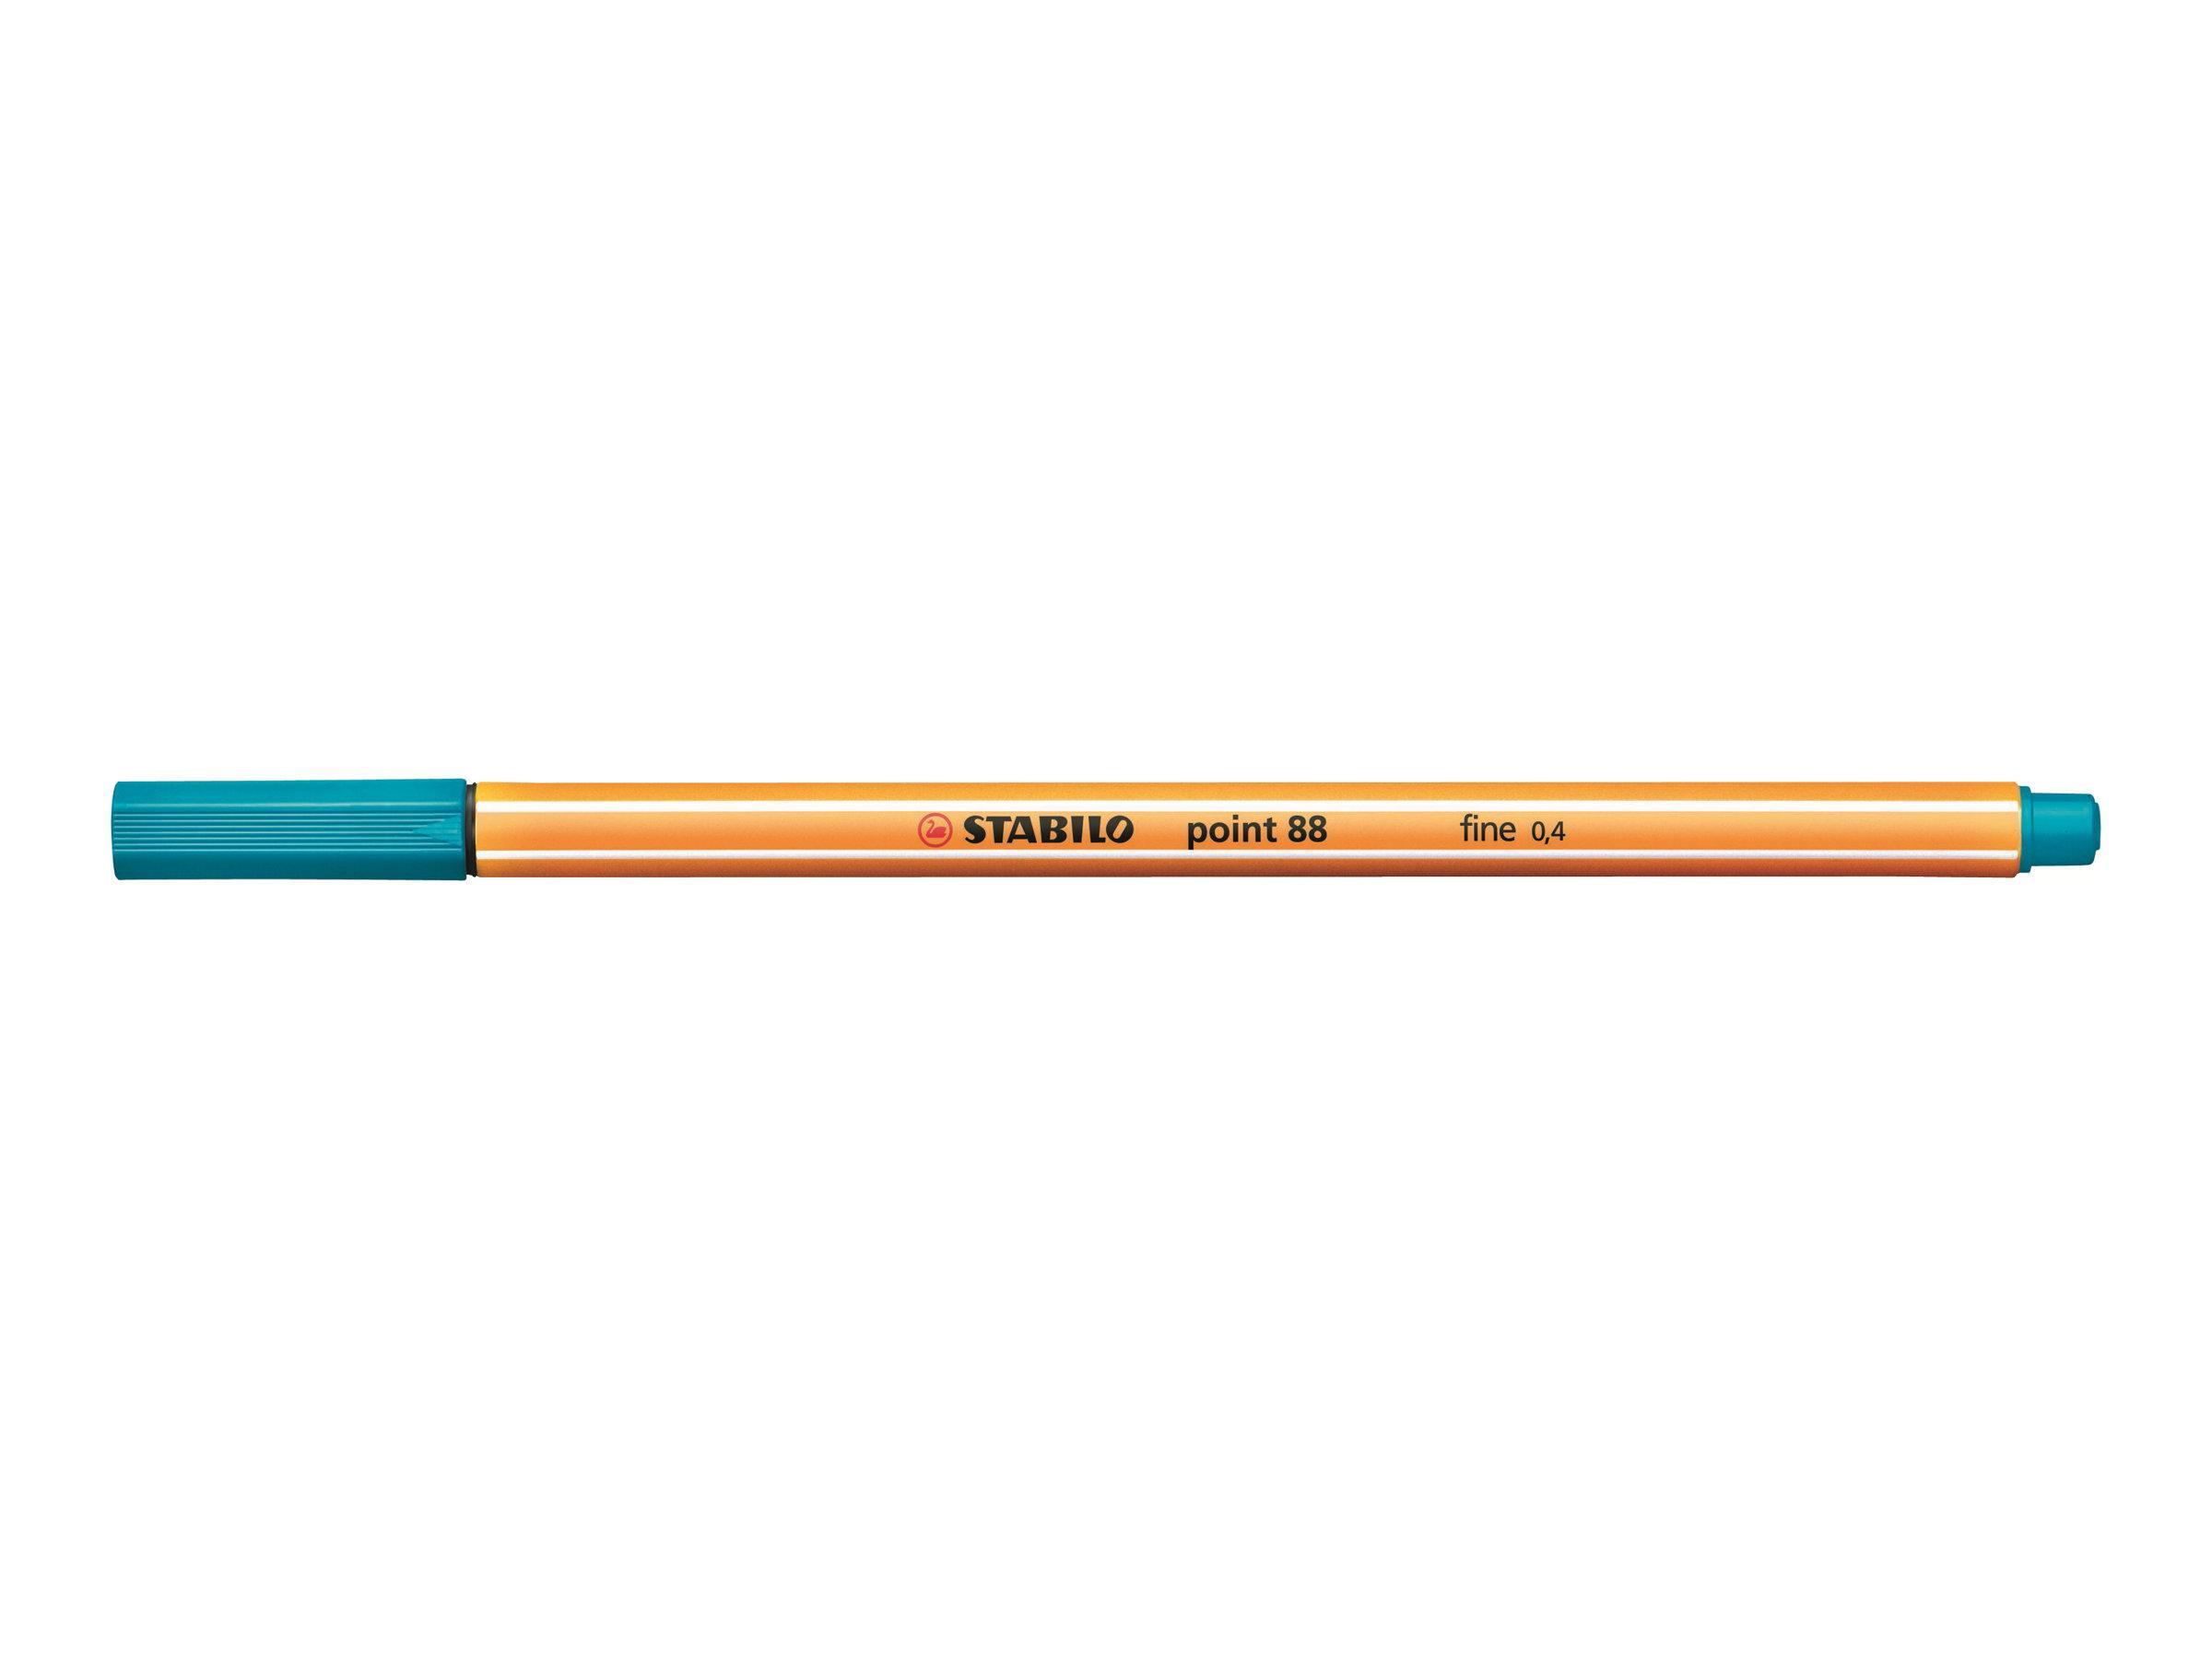 STABILO point 88 - Feutre fin - 0.4 mm - turquoise